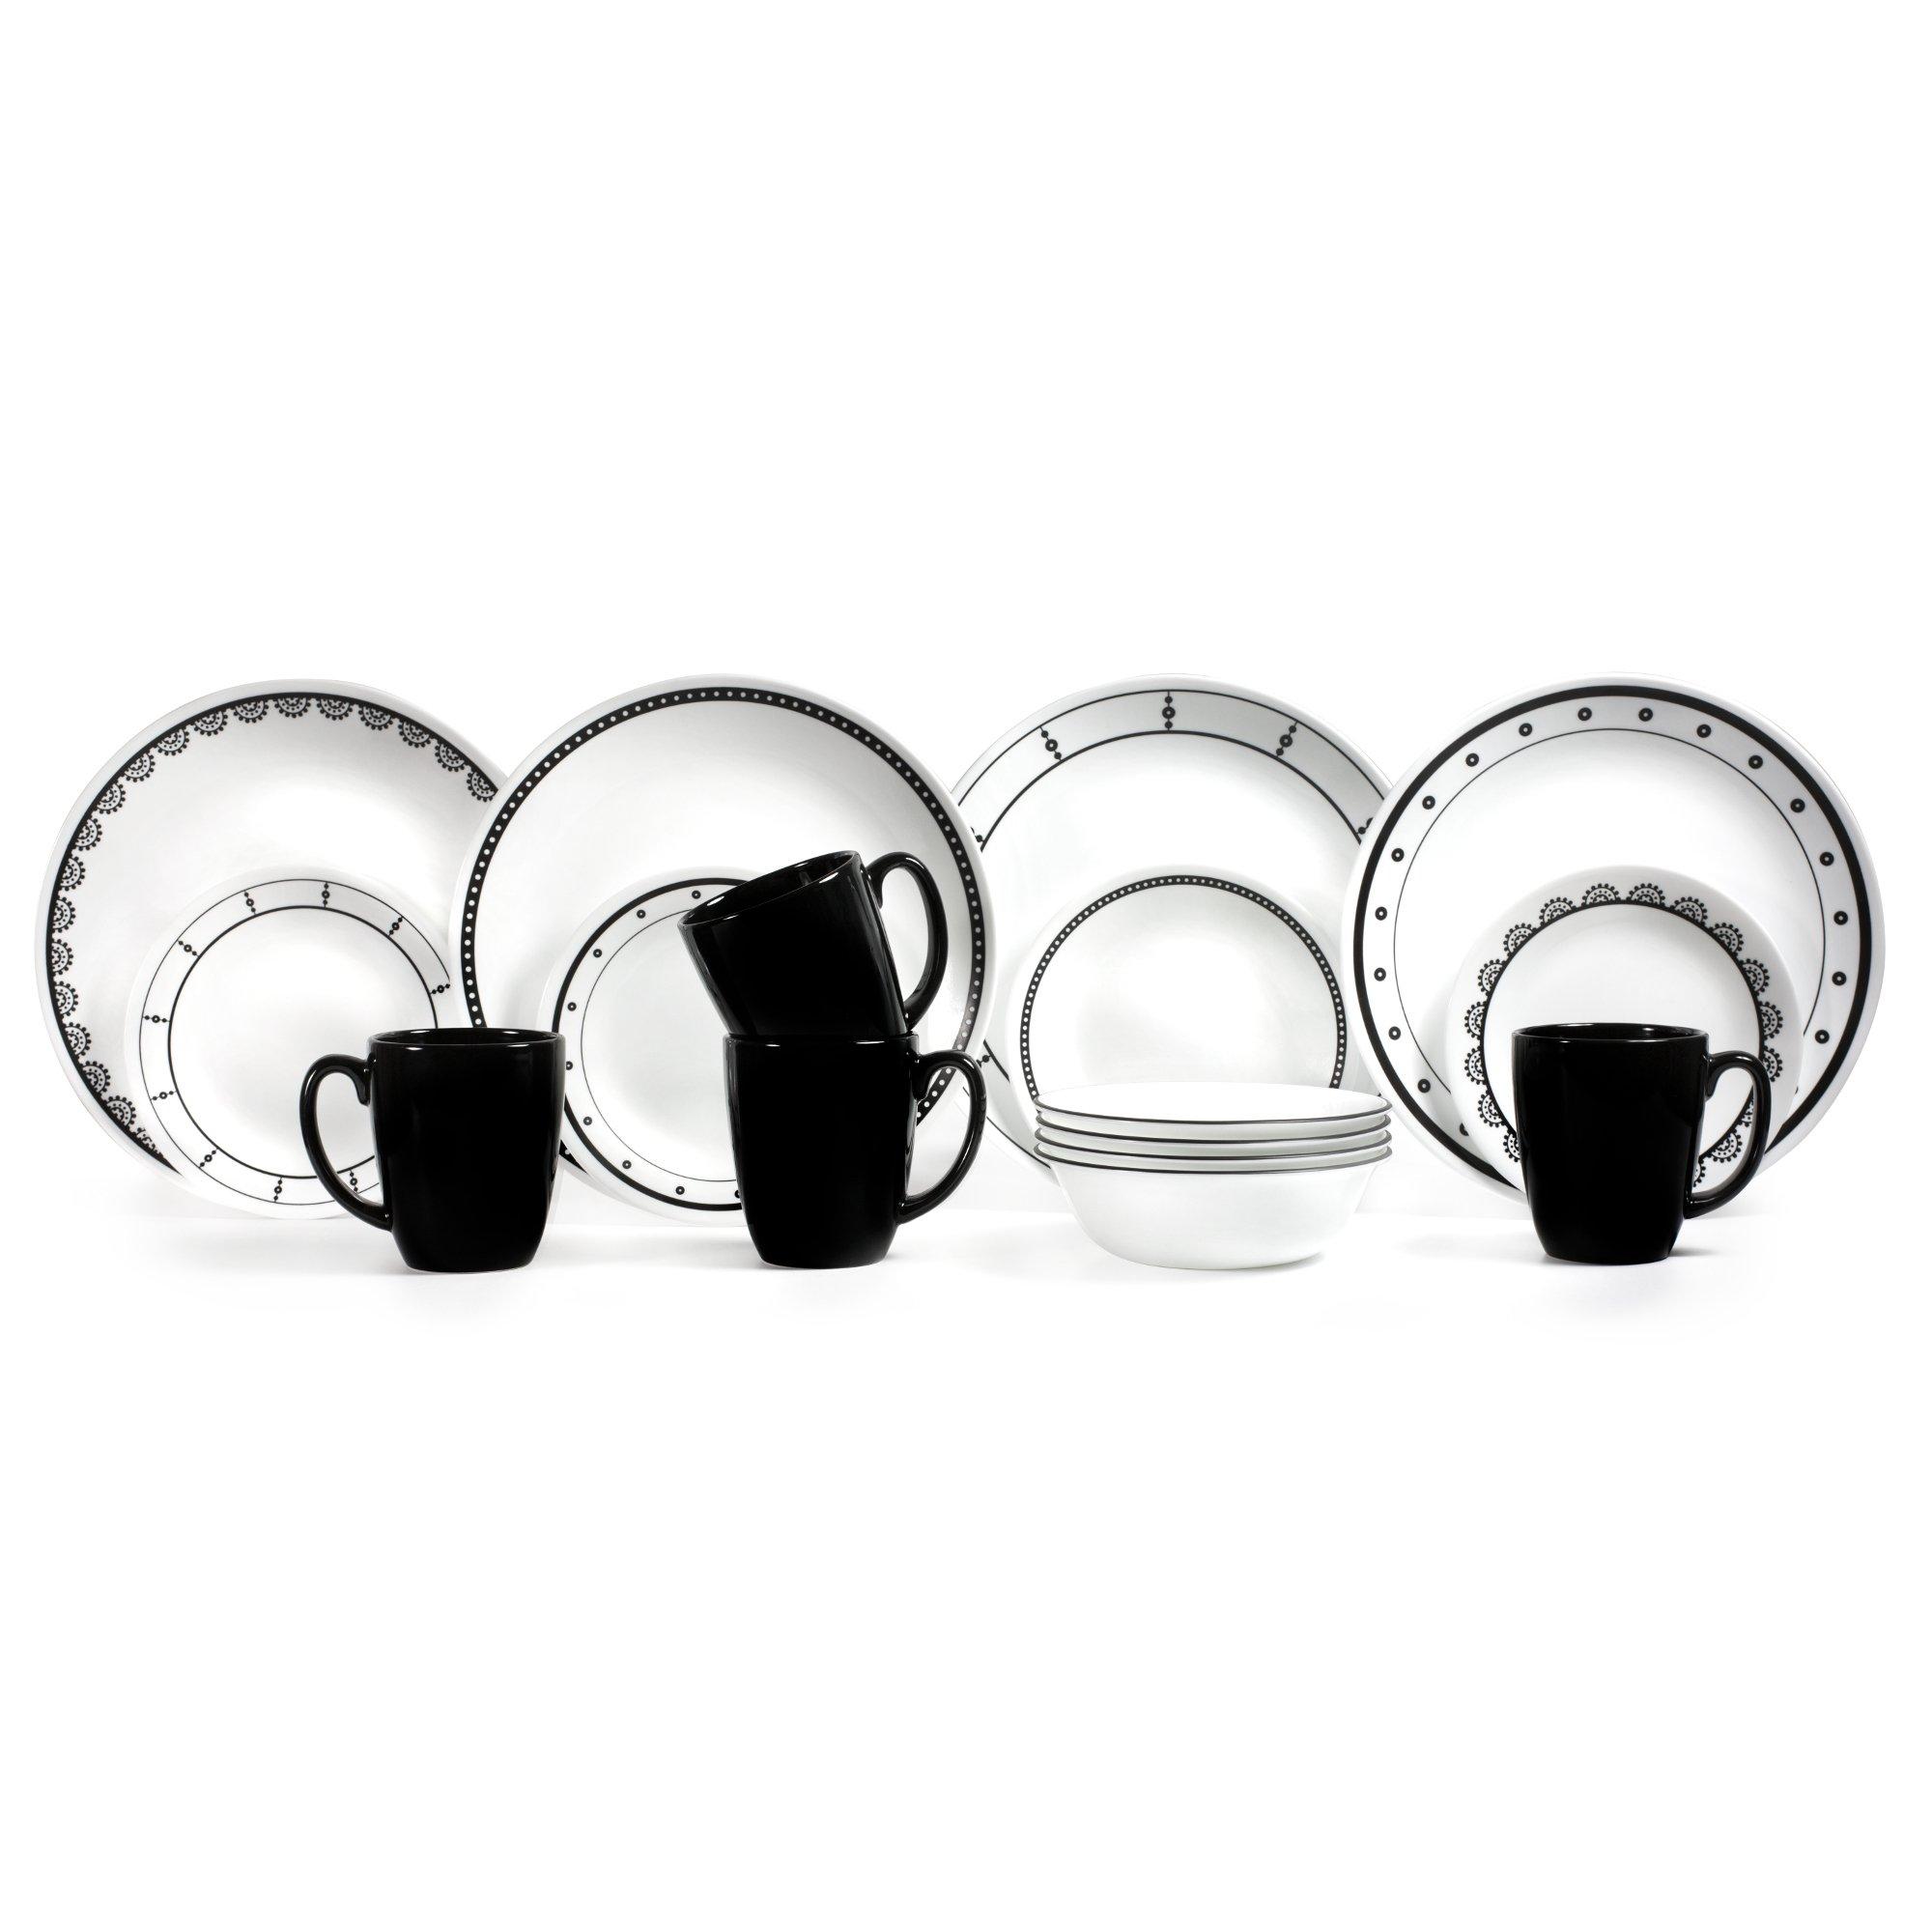 Corelle 3236 Chip and Break Resistant Dinner Set 16 Pieces, Black/White